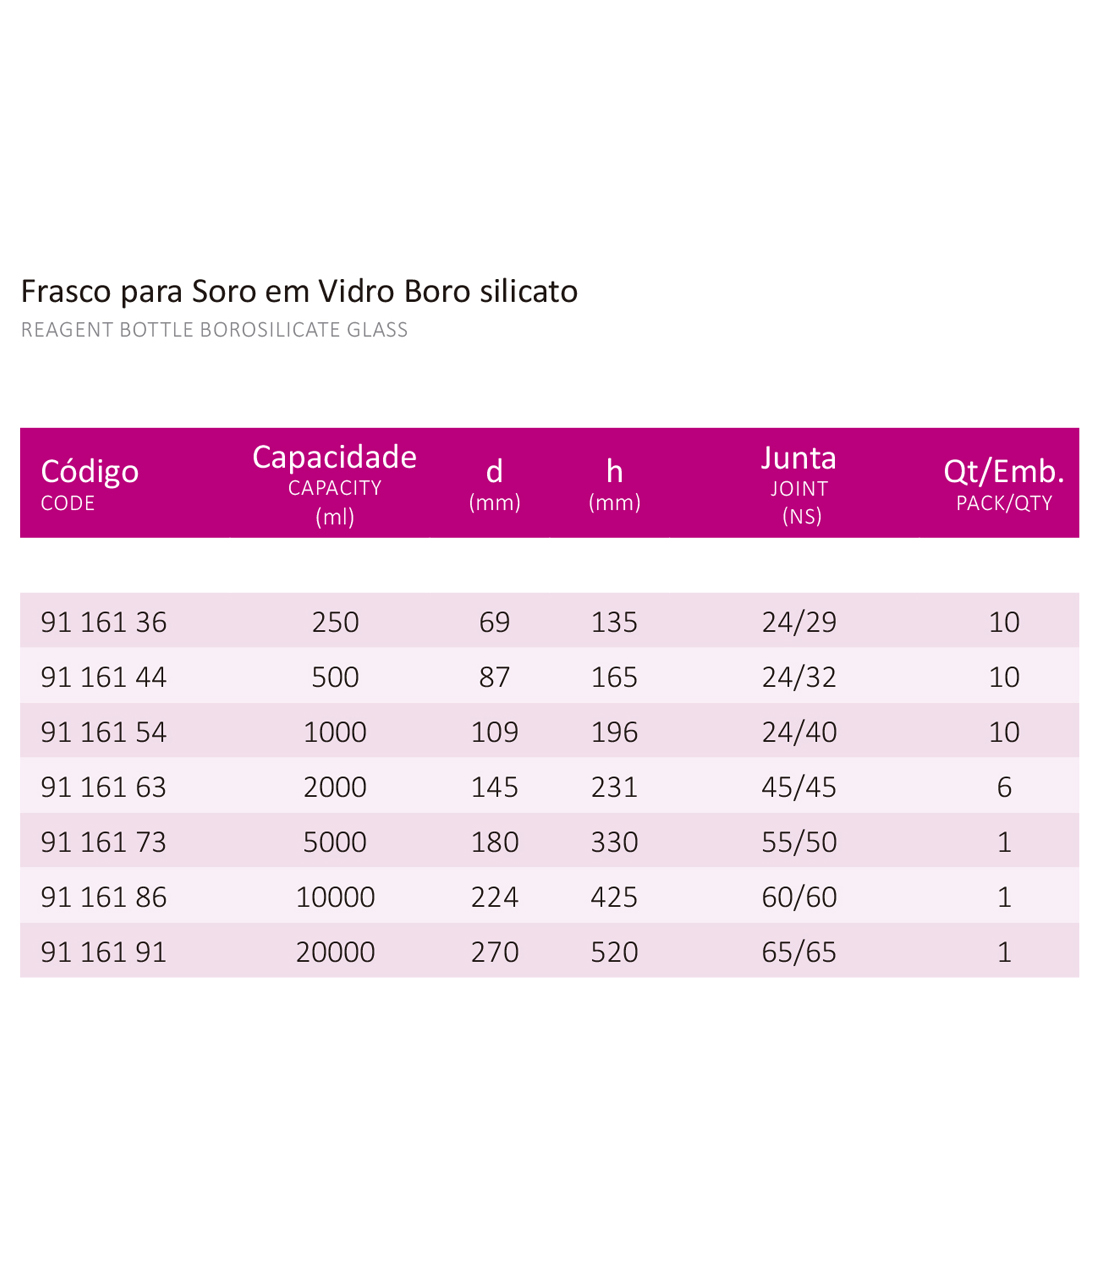 FRASCO P/ SORO BOROSILICATO C/ROLHA 2OOO ML - Laborglas - Cód. 9116163